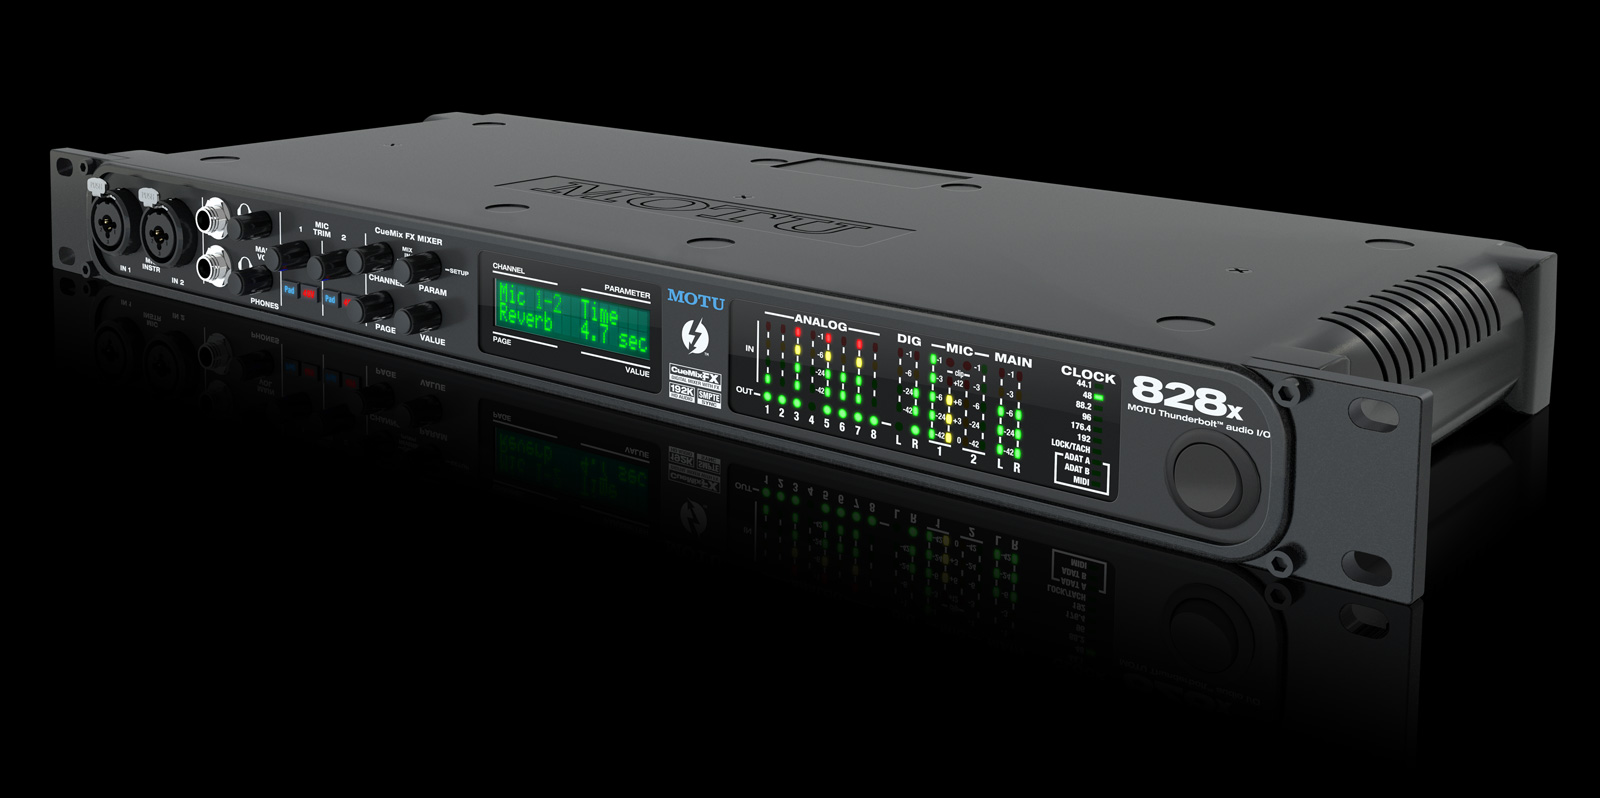 motu-828x-audio-interface-front